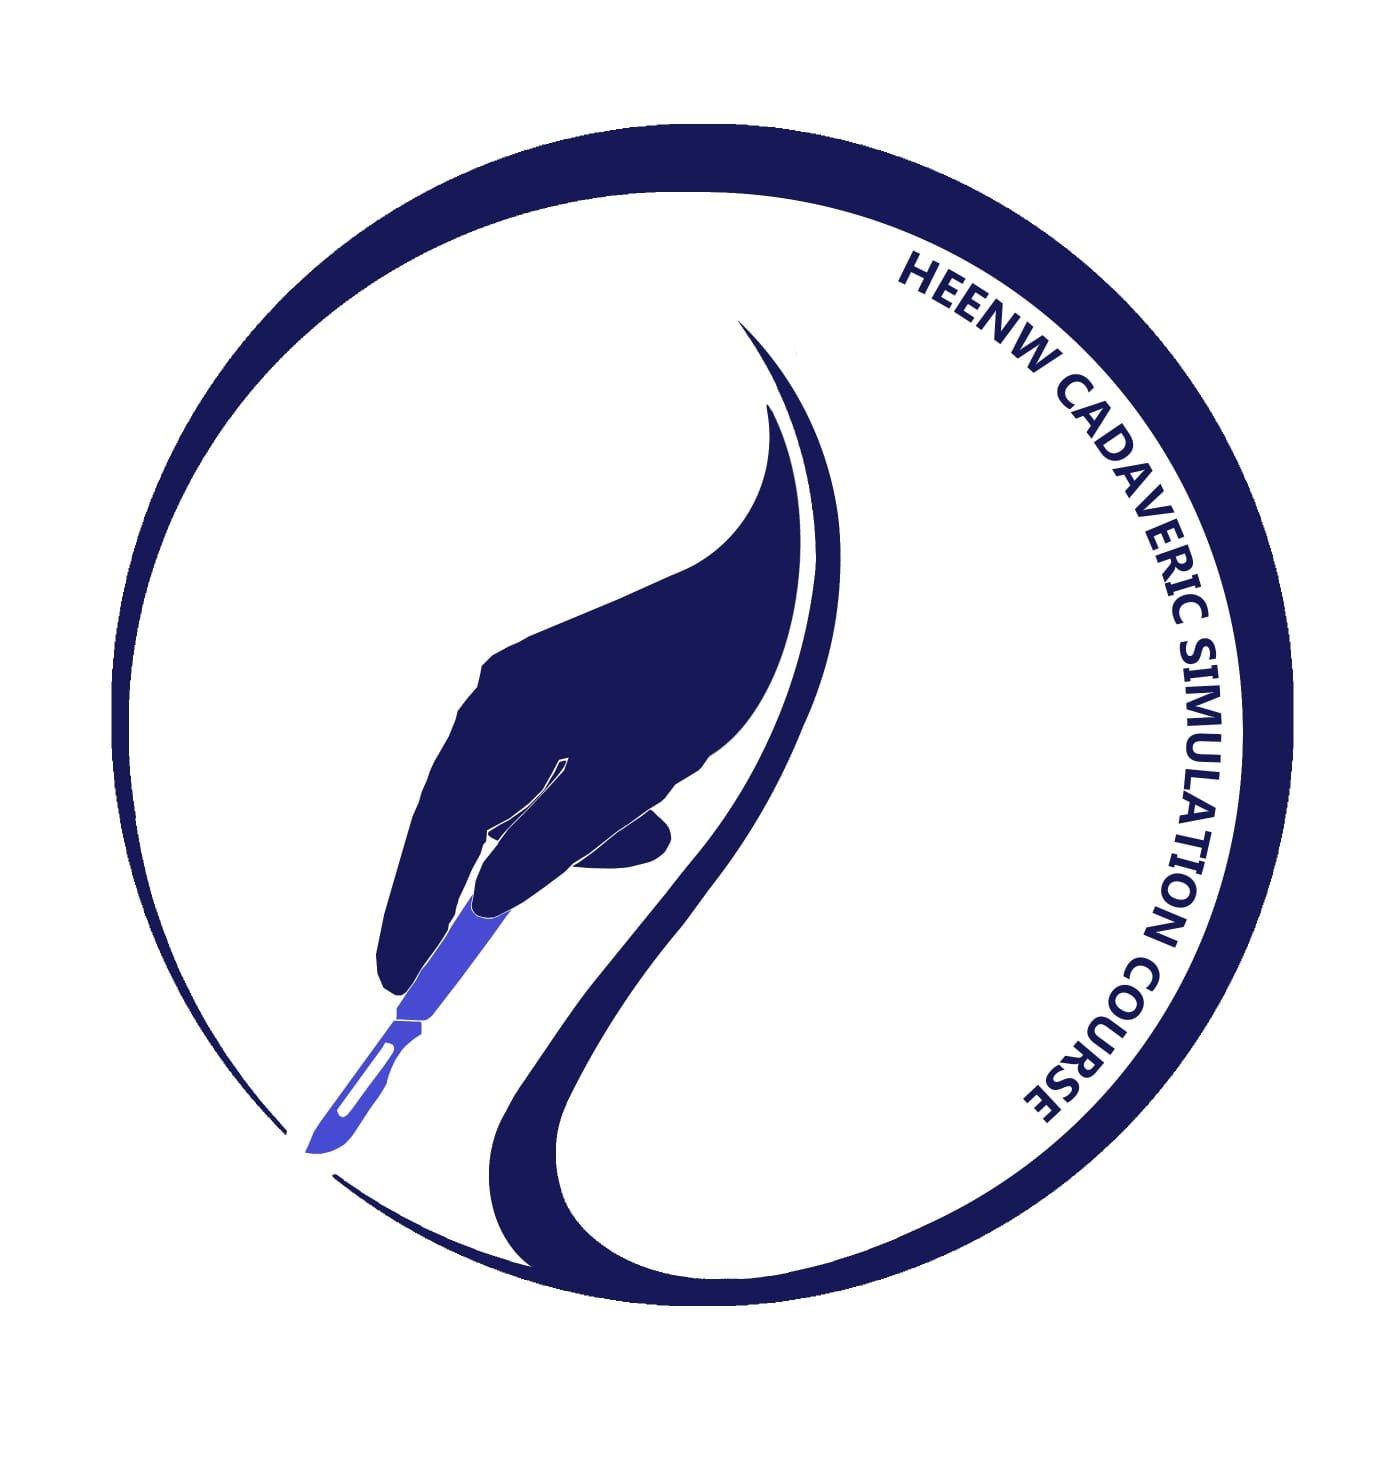 HEENW Cadaveric Simulation Course (@BTBC14) | Twitter